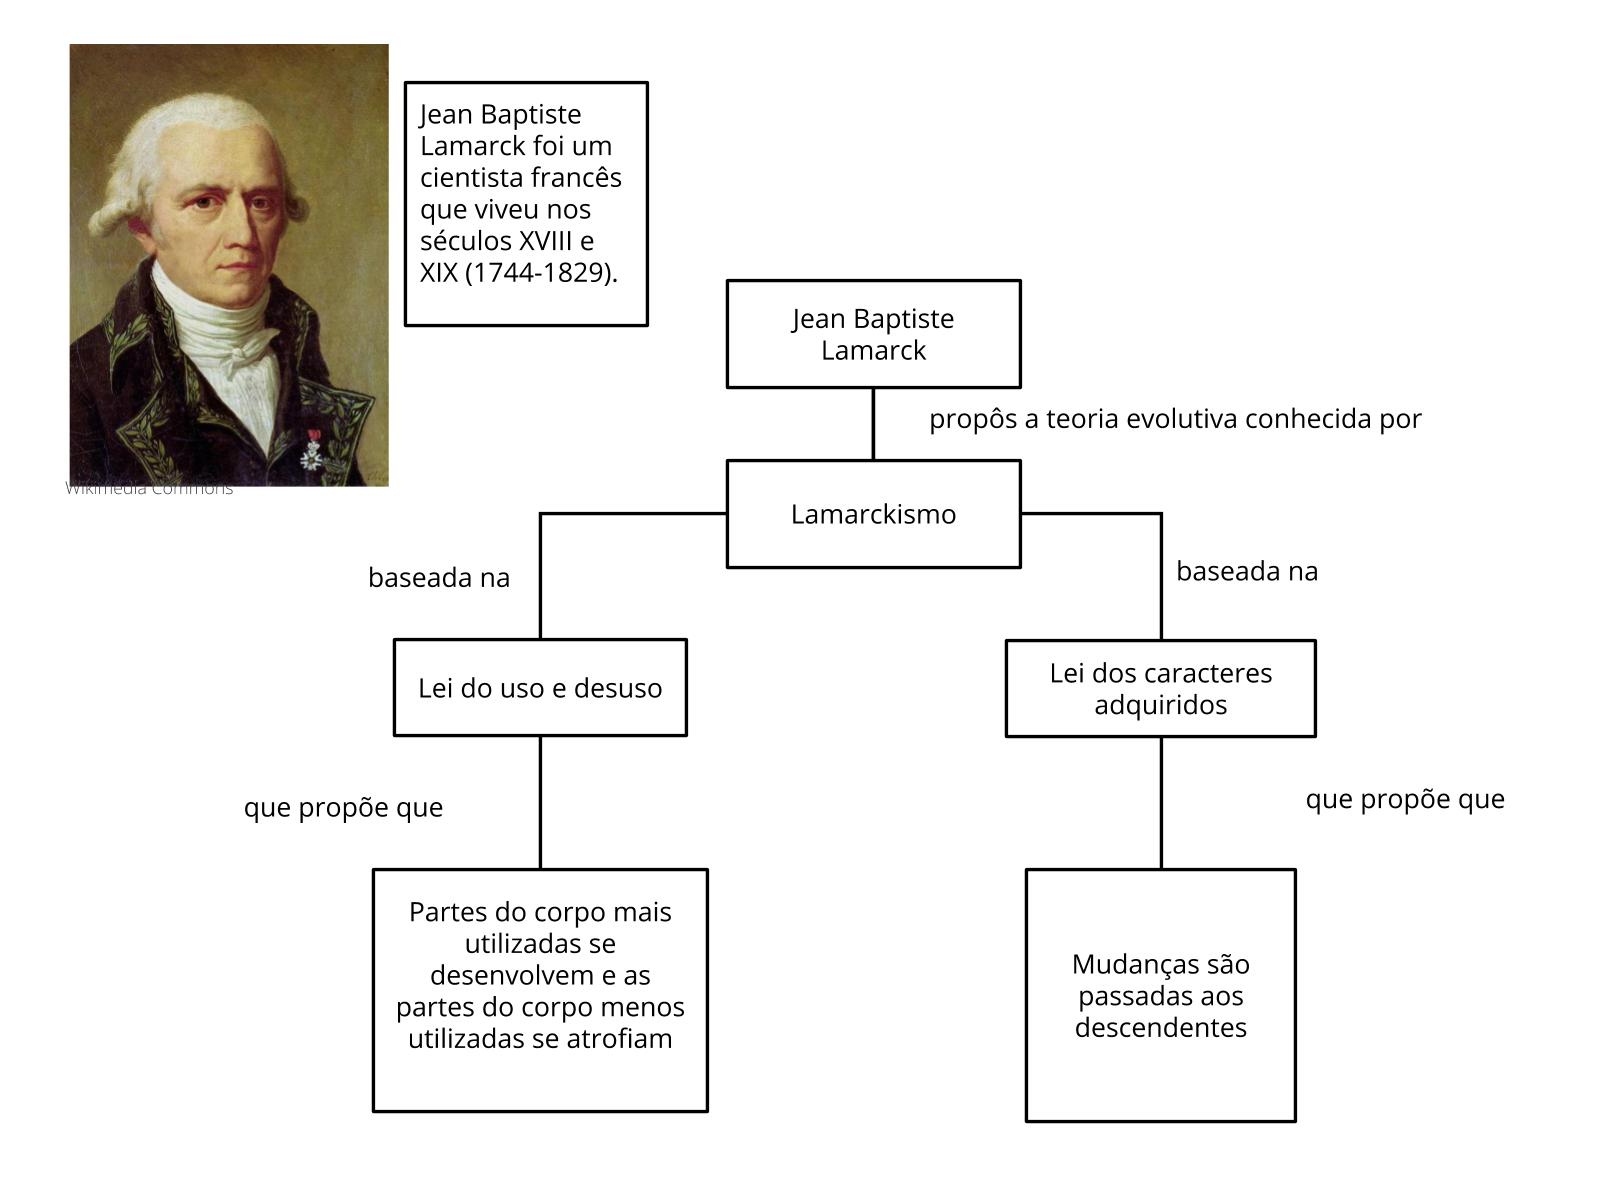 Ideias evolutivas: Lamarck